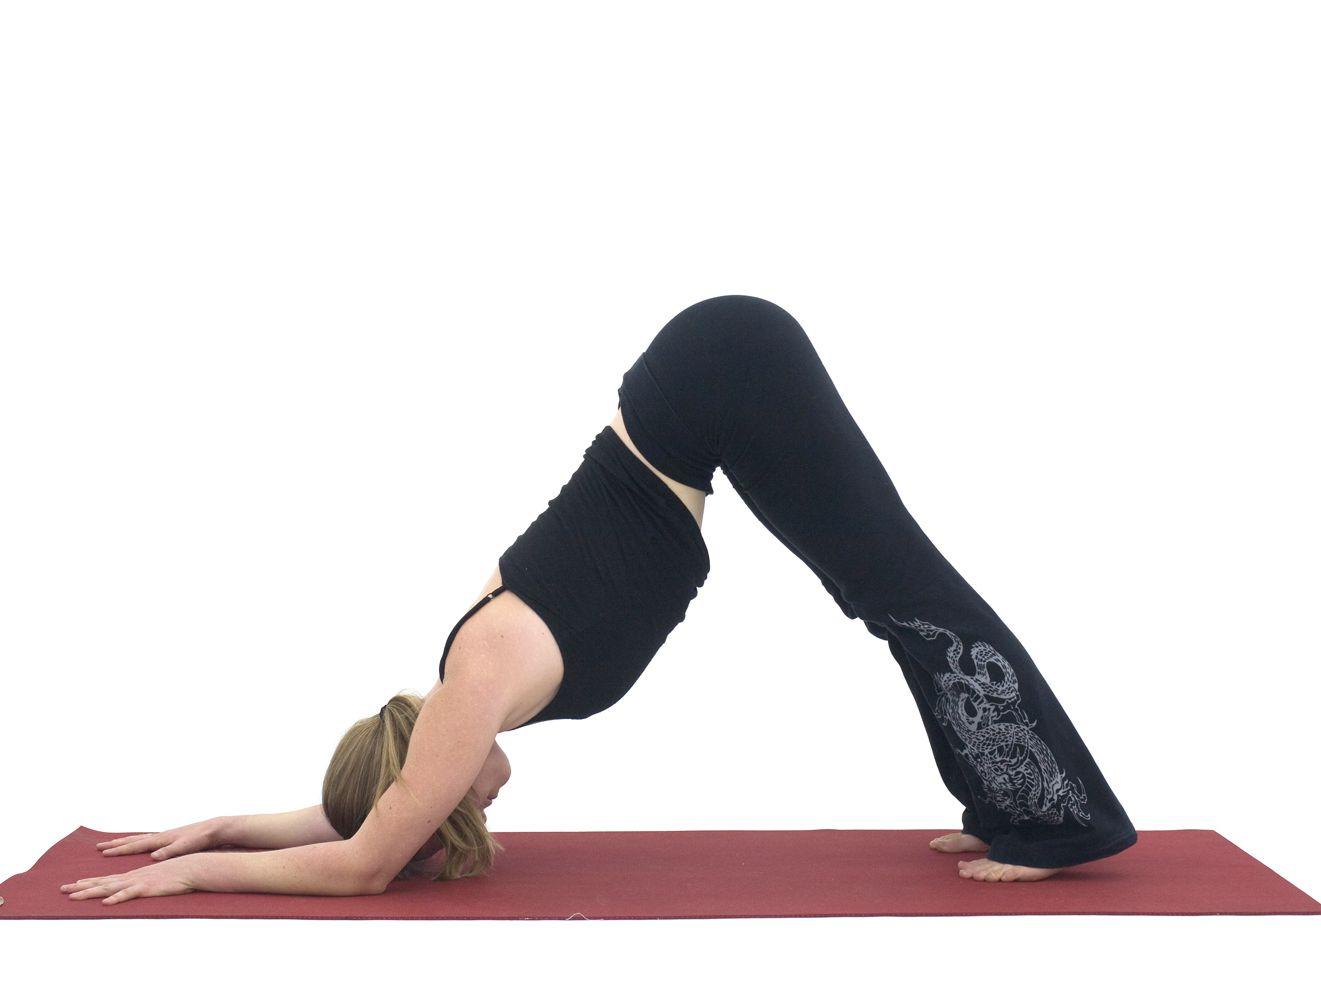 77845a6e53 Yoga for Carpal Tunnel Syndrome